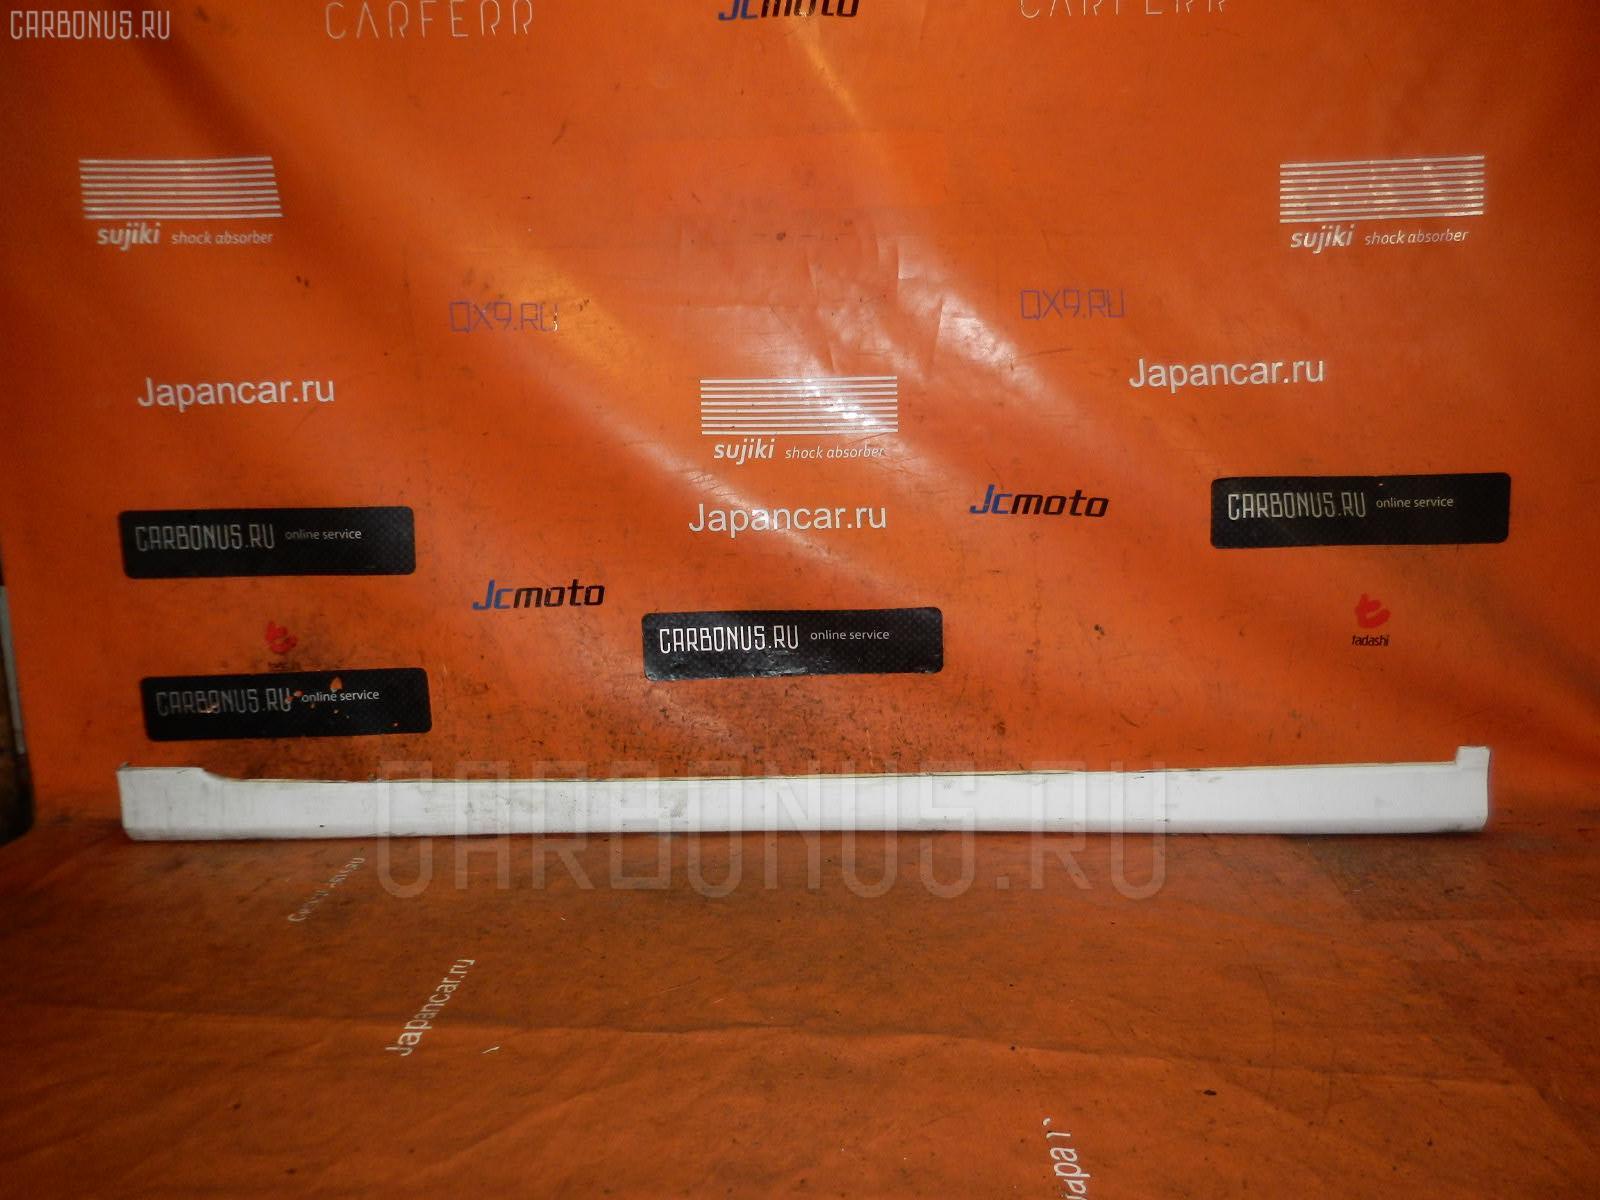 Порог кузова пластиковый ( обвес ) SUBARU LEGACY WAGON BH9 Фото 1